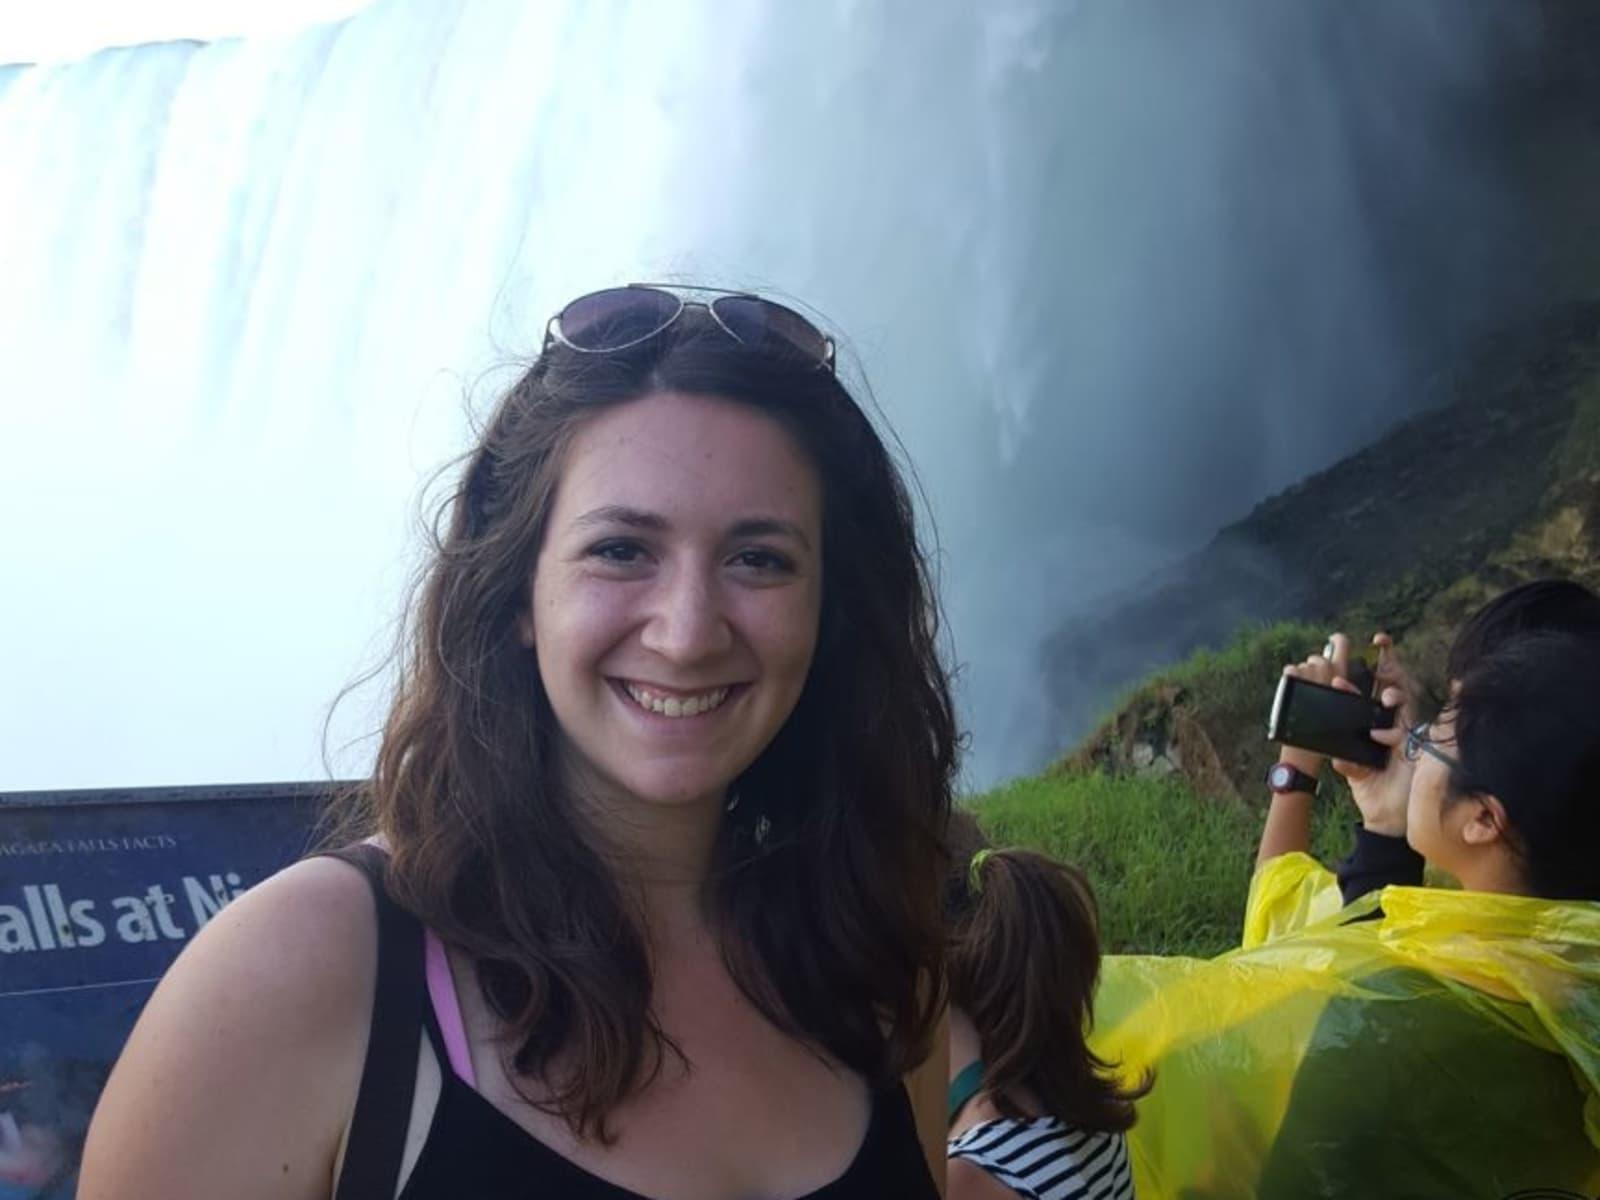 Megan from Vancouver, British Columbia, Canada